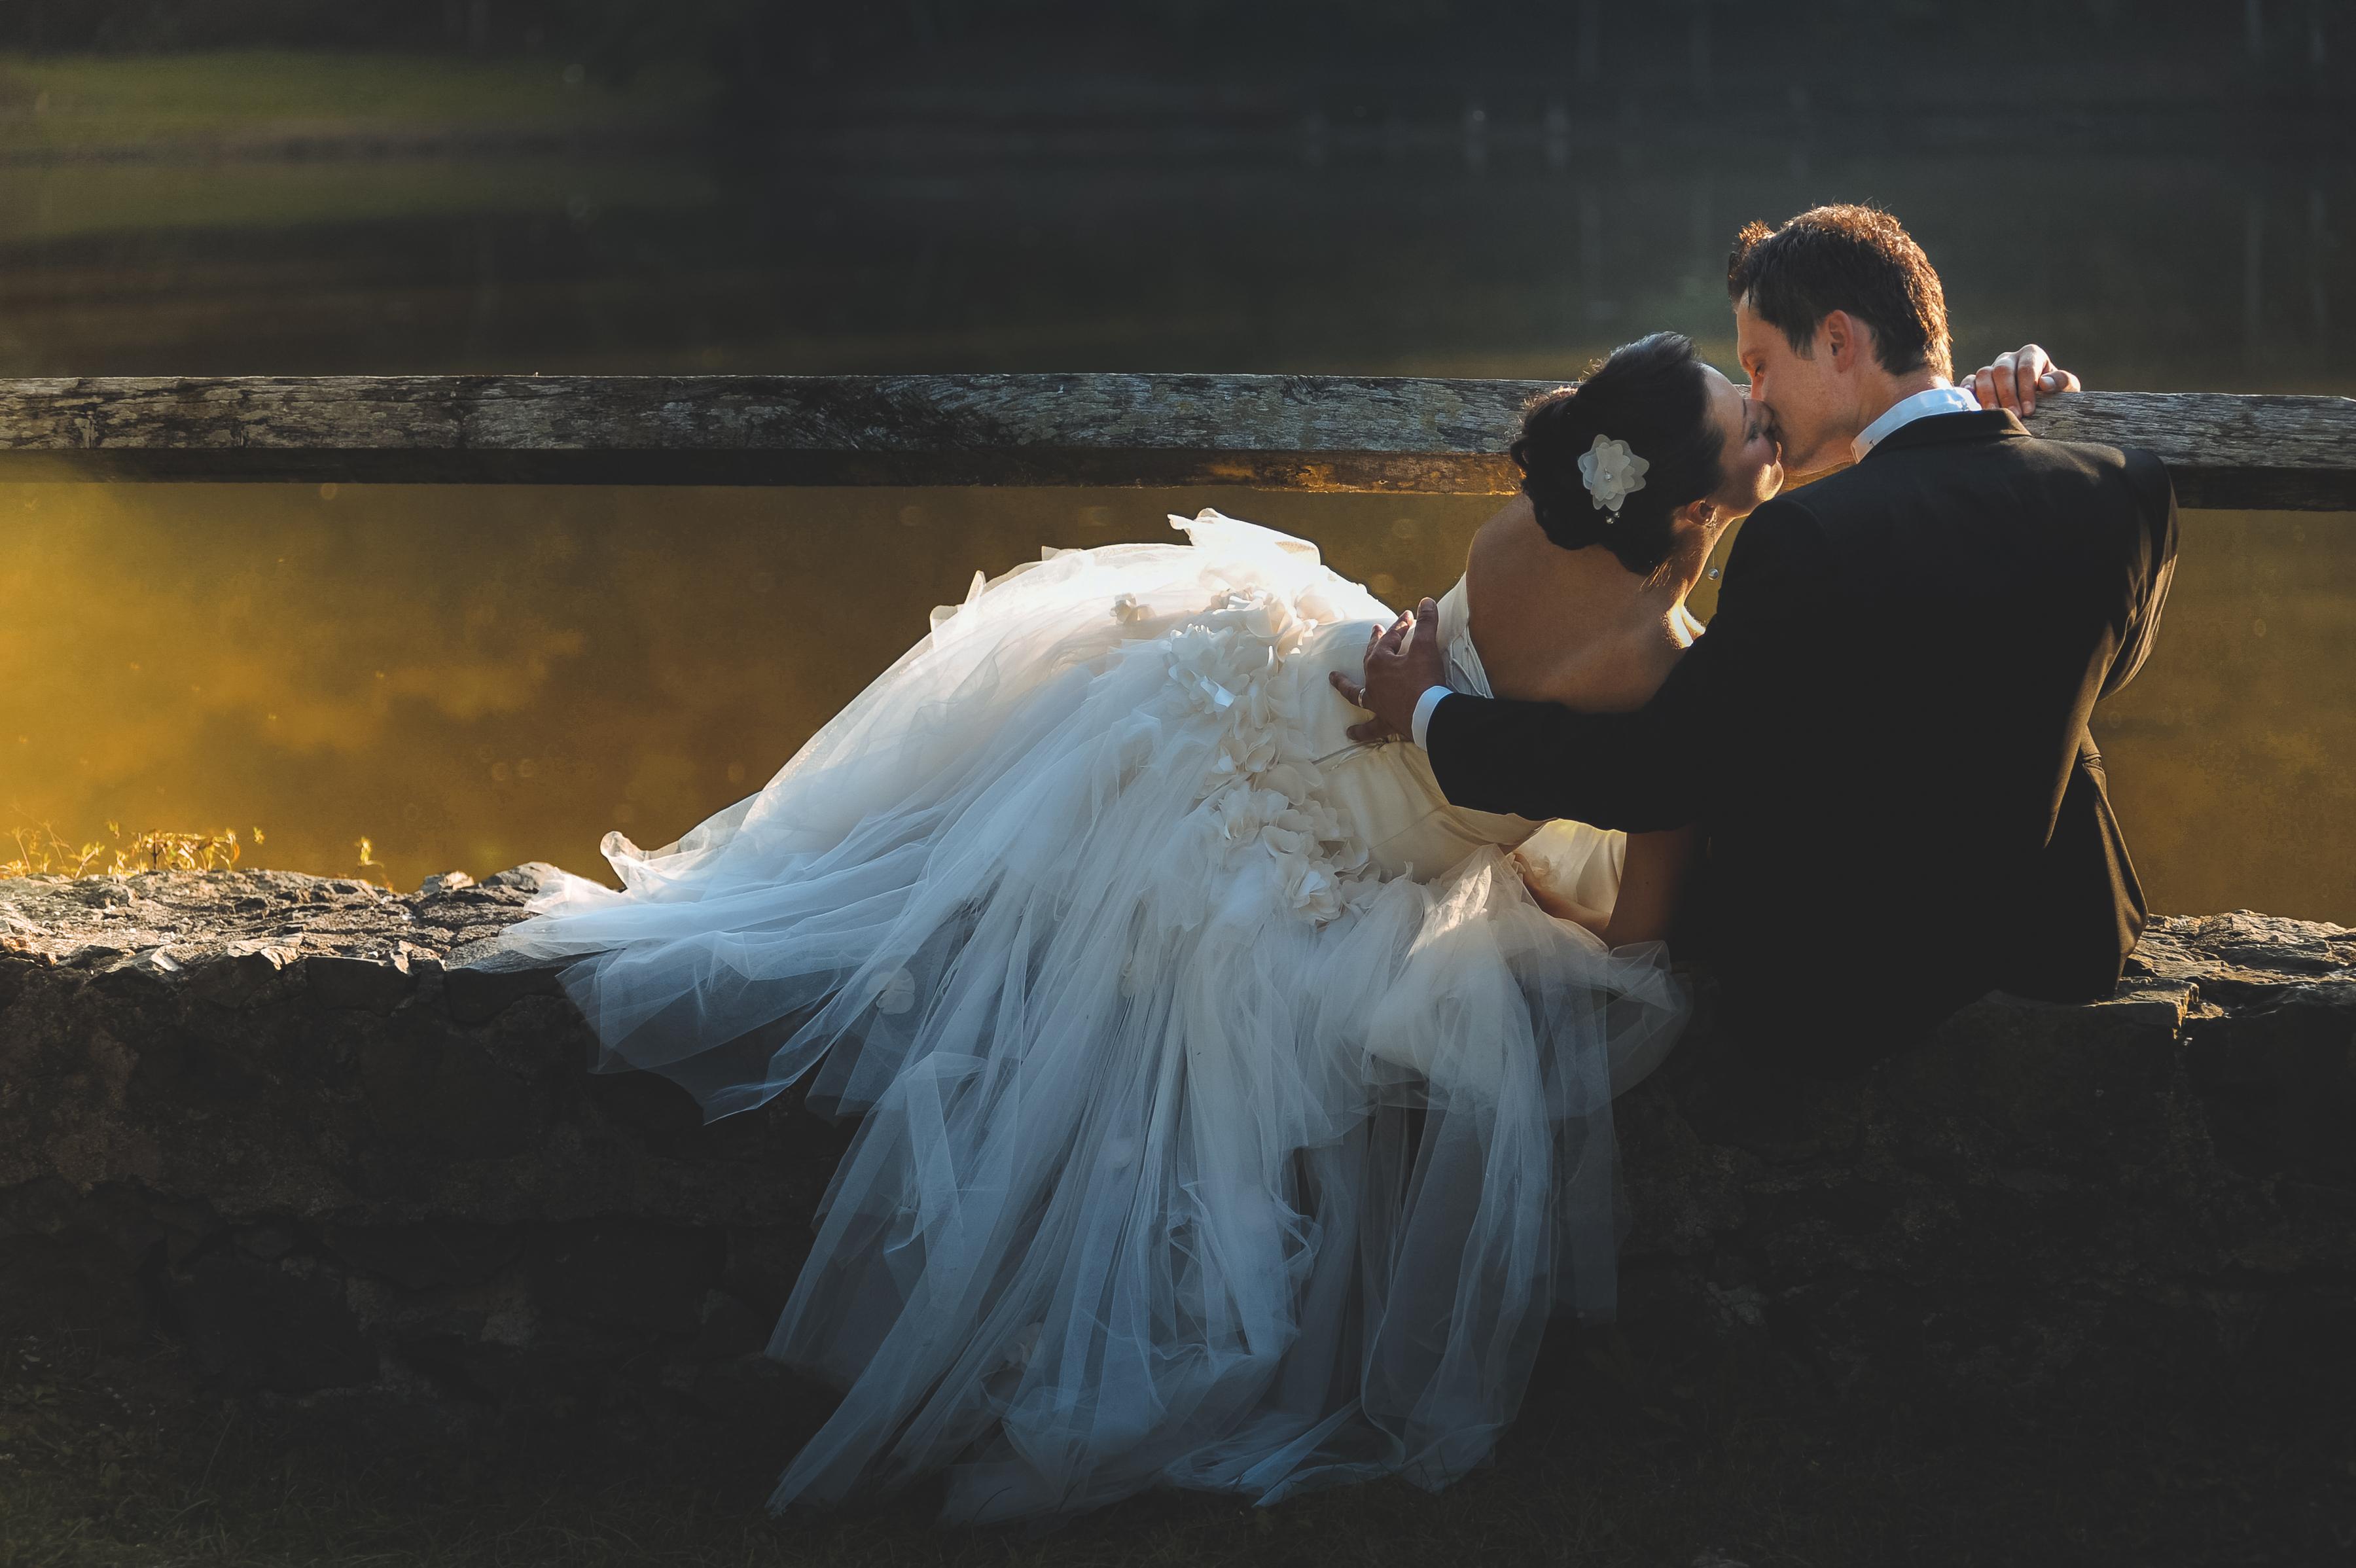 https://sleeklens.com/wp-content/uploads/2018/09/wedding-lightroom-presets-signature-bride-groom-after-3.jpg